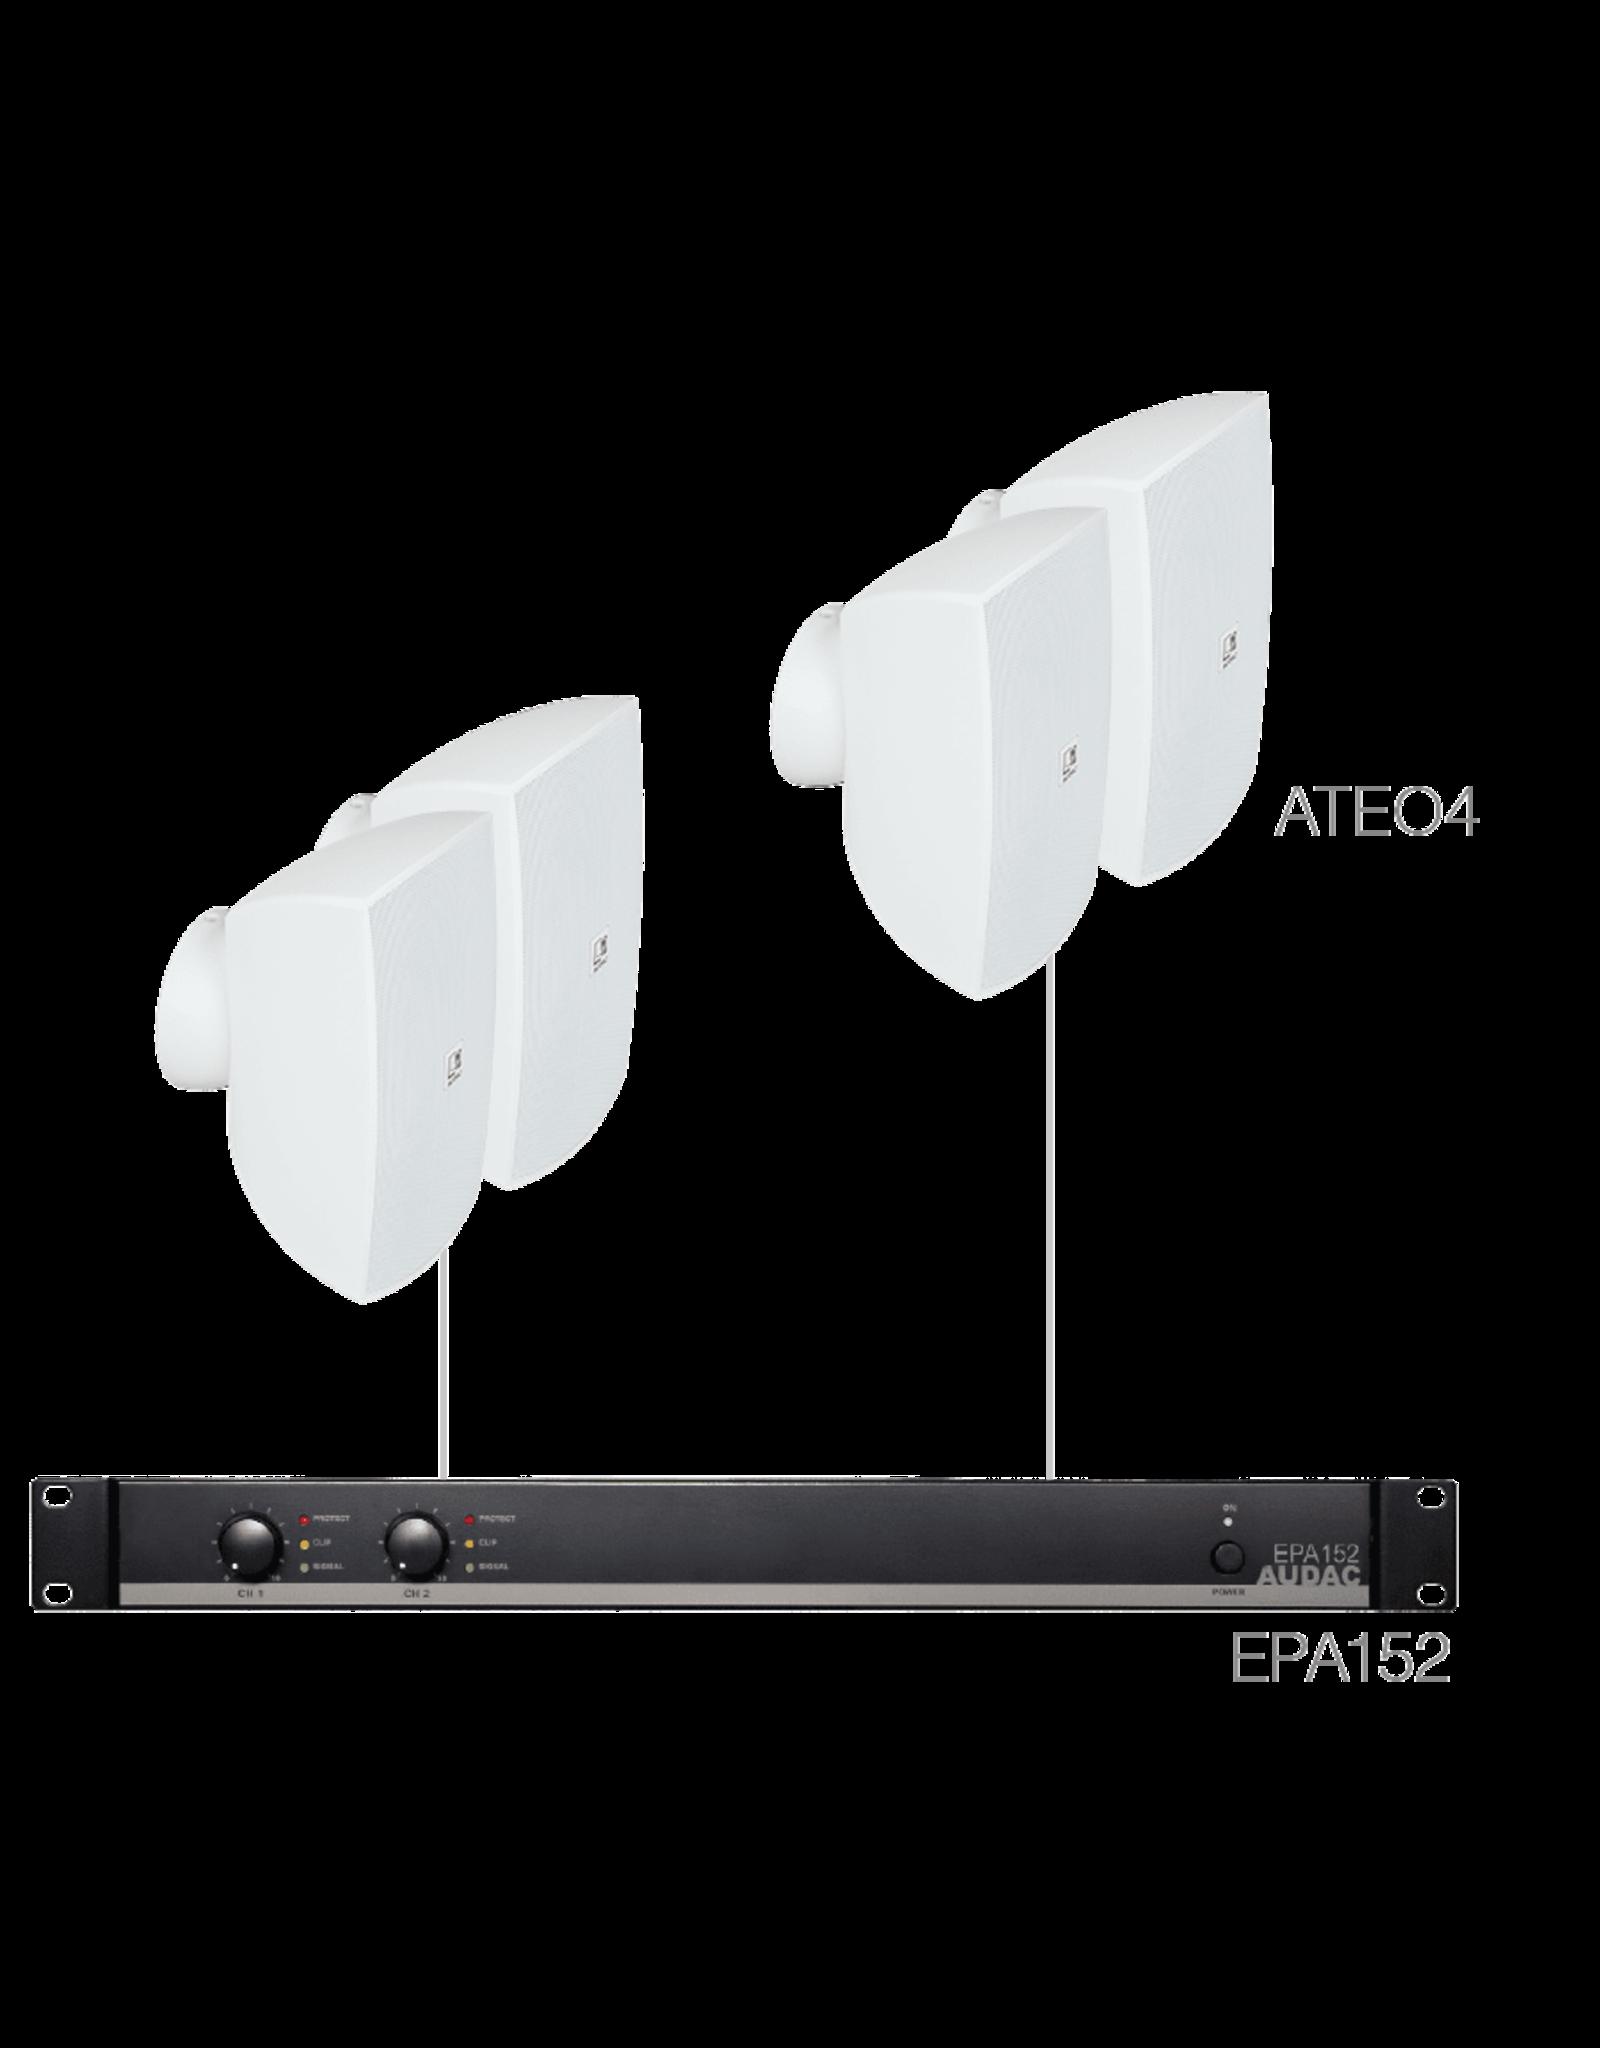 Audac 4 x ATEO4 + EPA152 White